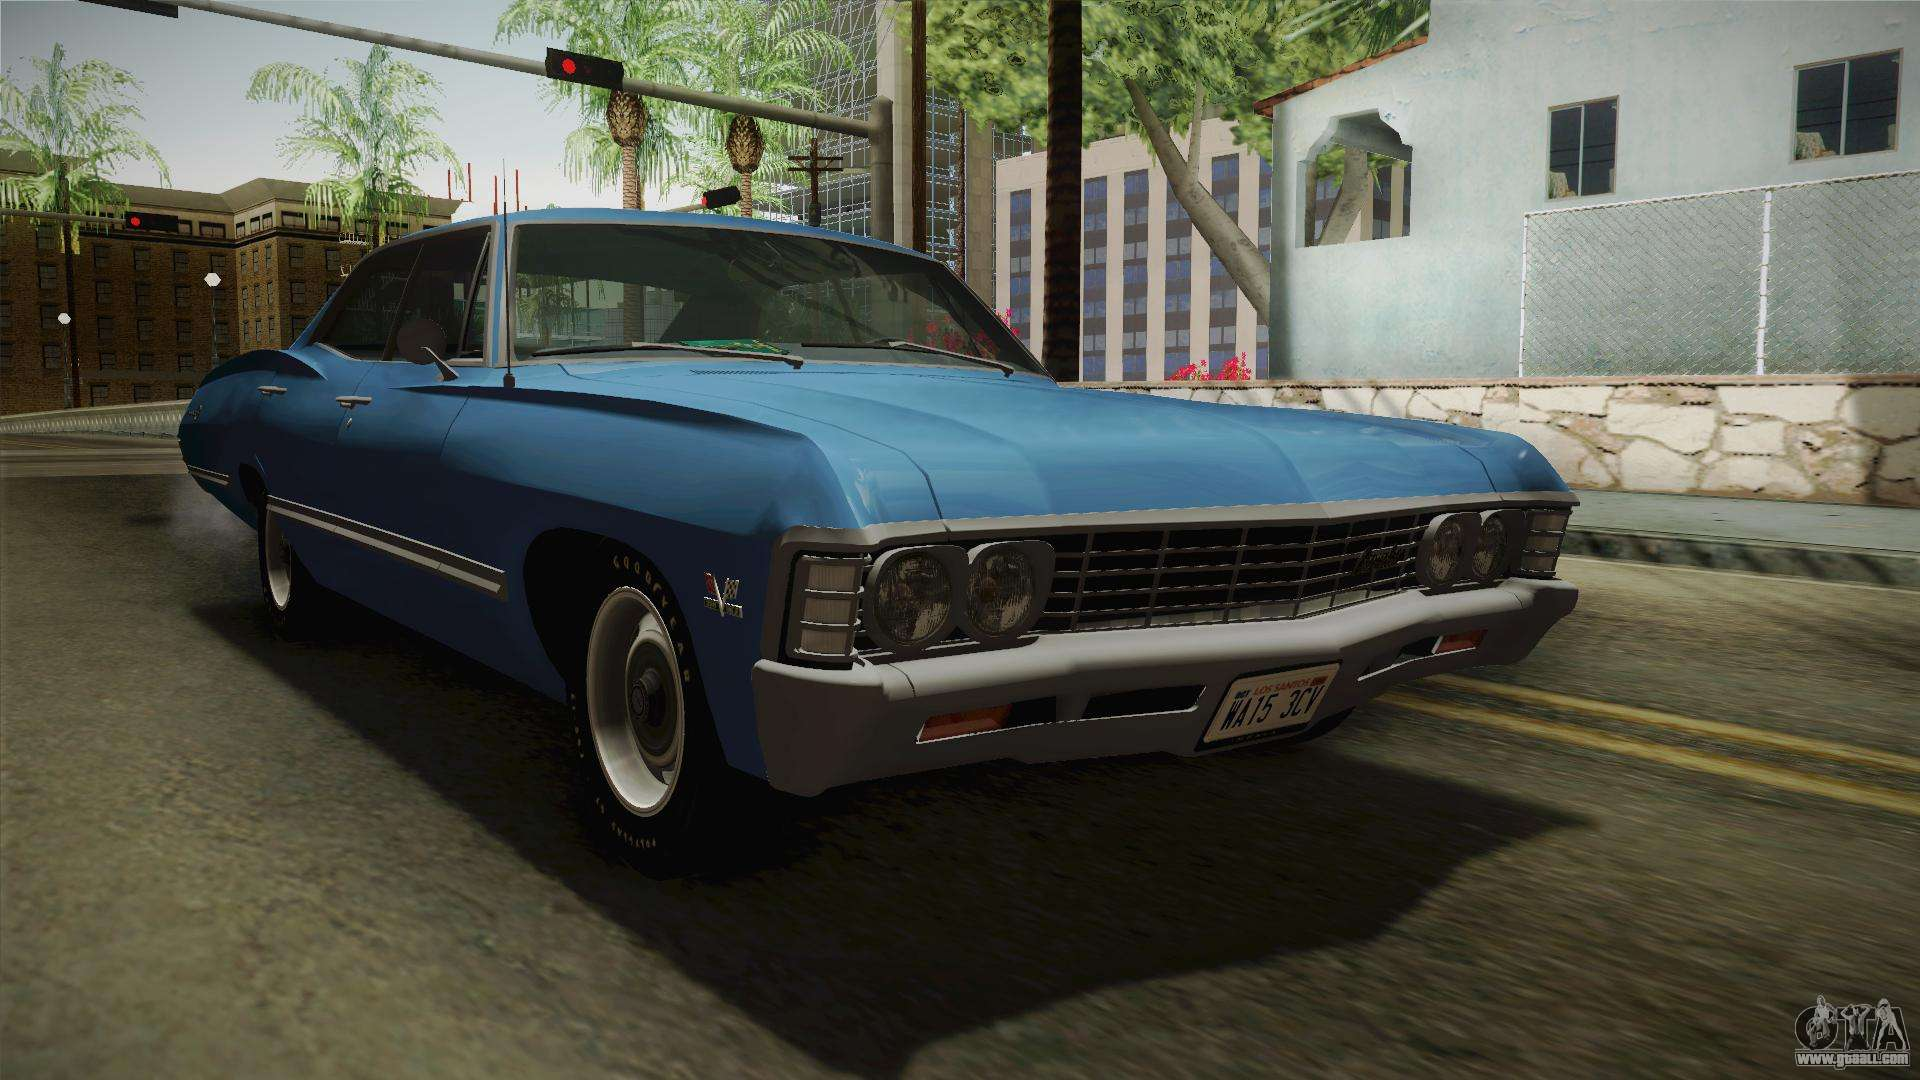 Chevrolet impala 4 door hardtop 1963 for gta san andreas - Chevrolet Impala Sport Sedan 396 Turbo Jet 1967 For Gta San Andreas